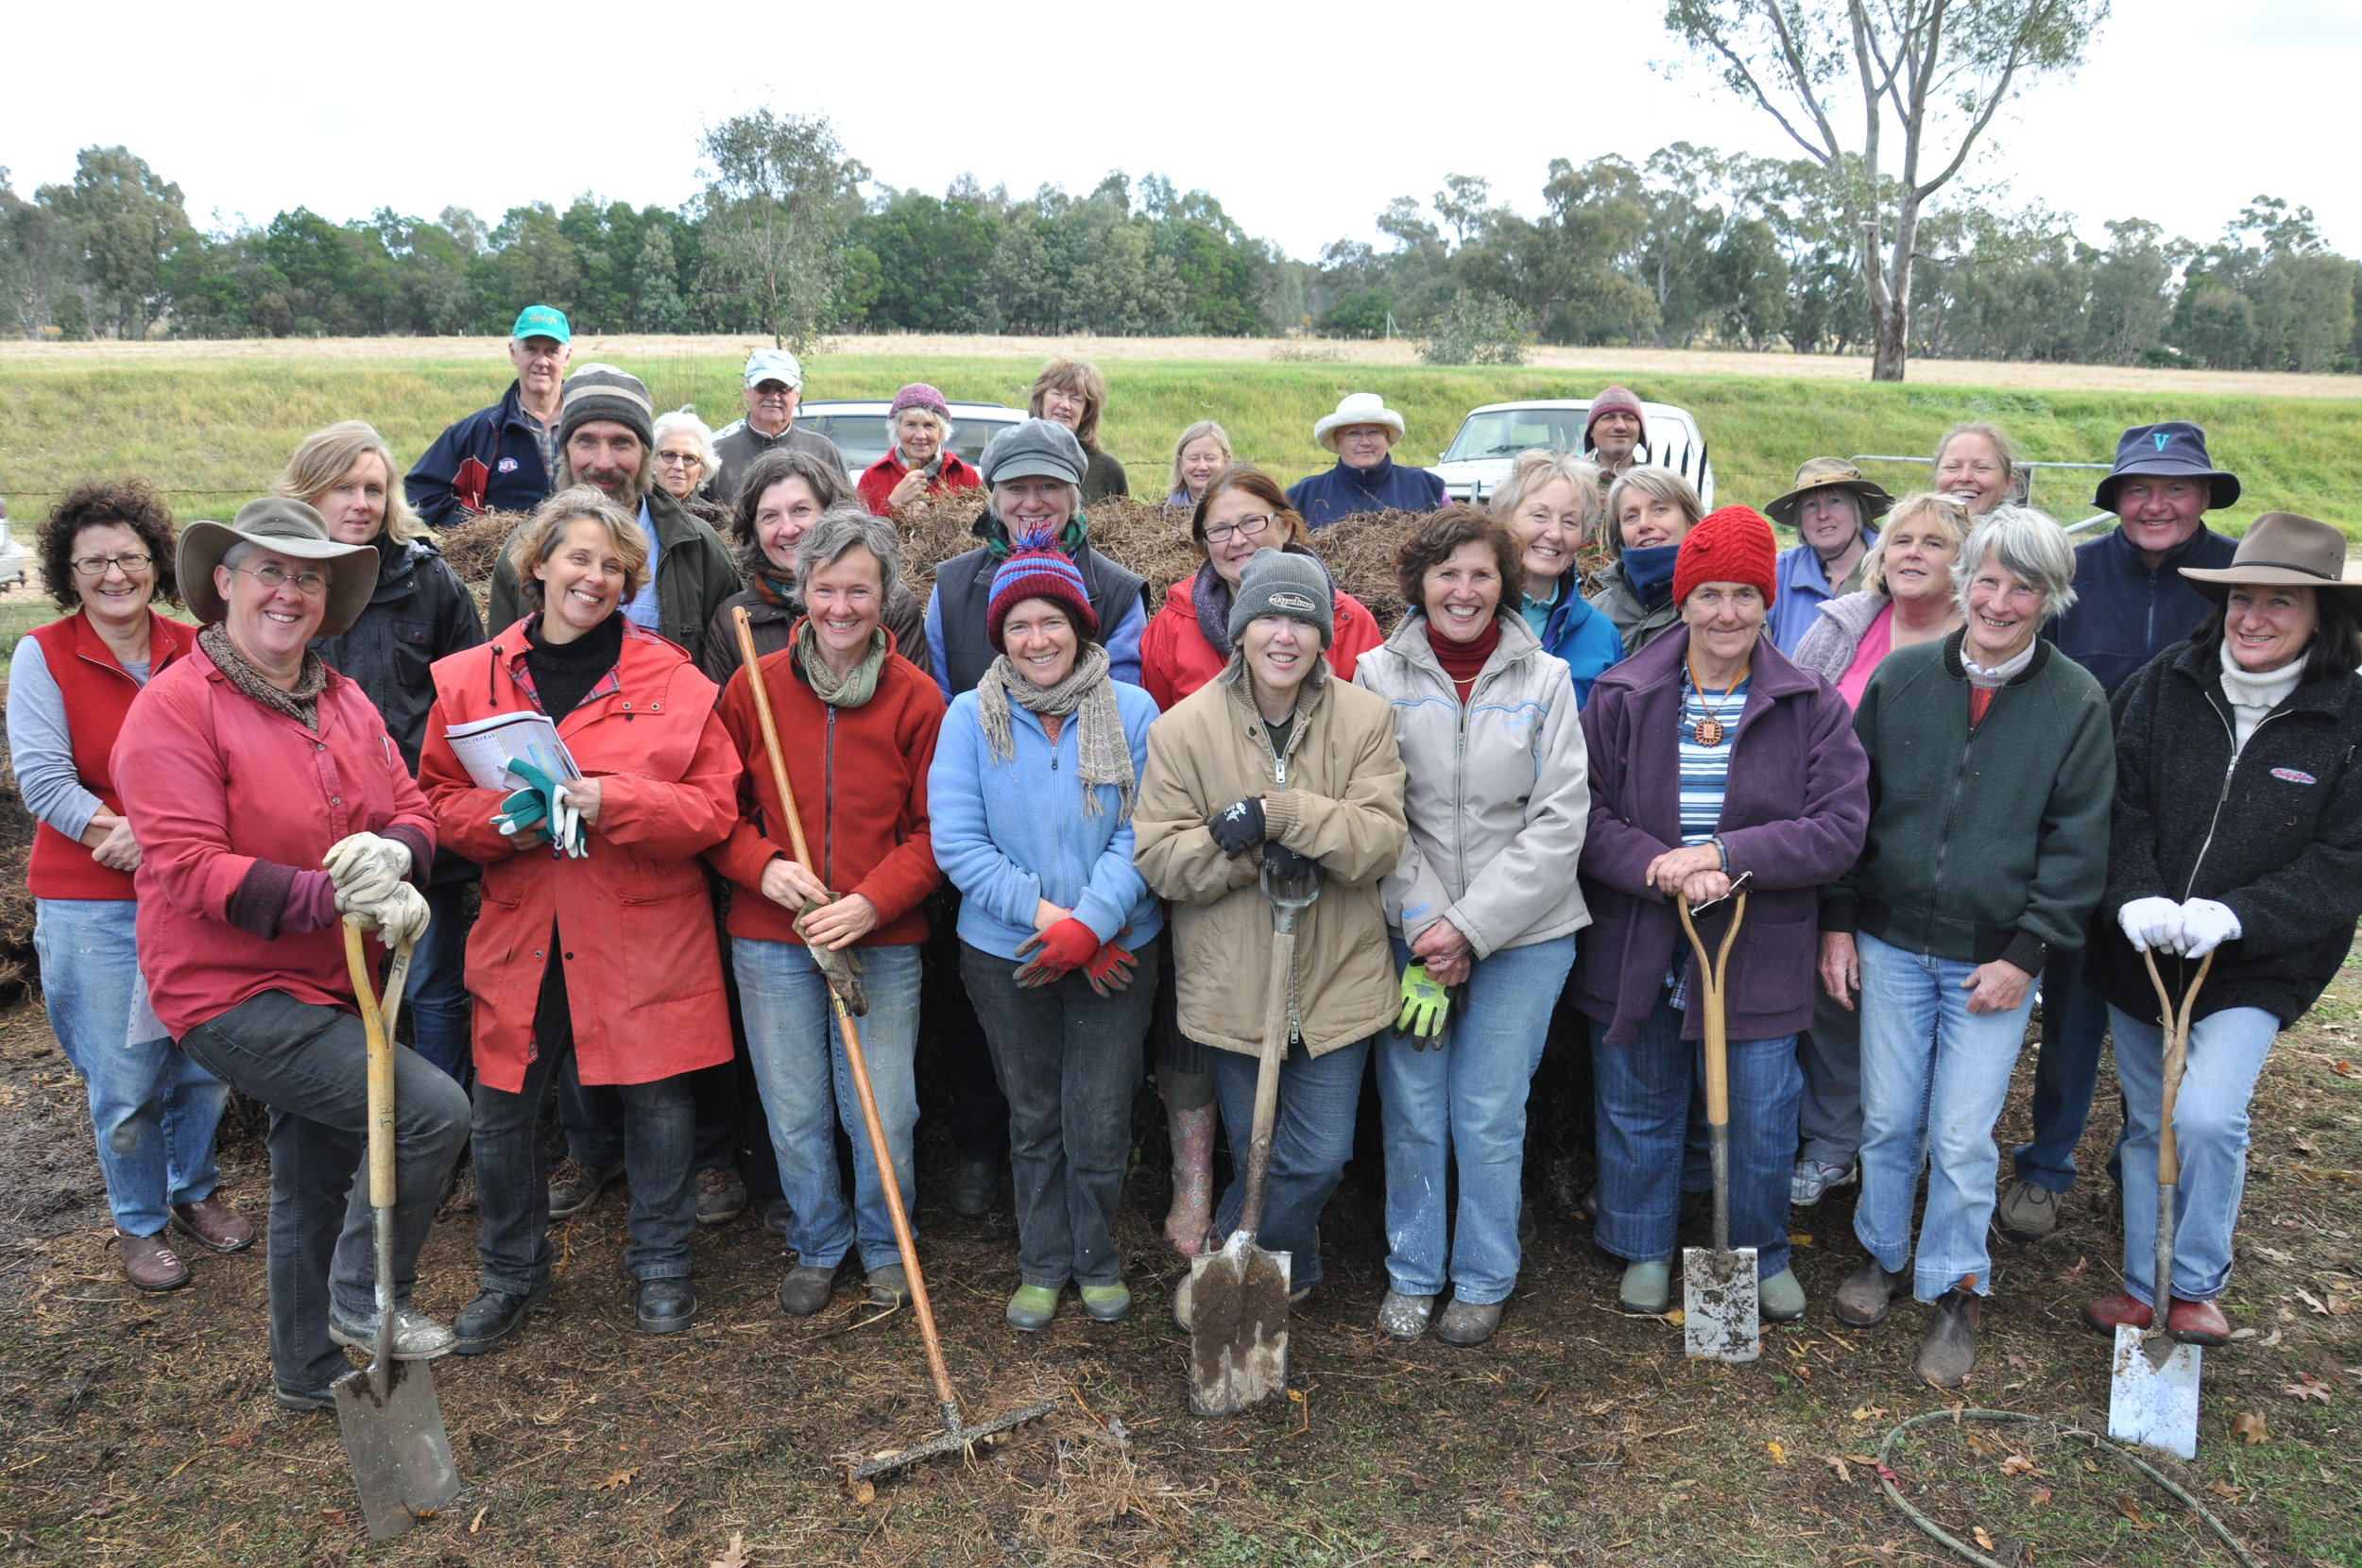 Members of the Newstead Community Garden group  https://newsteadgarden.wordpress.com